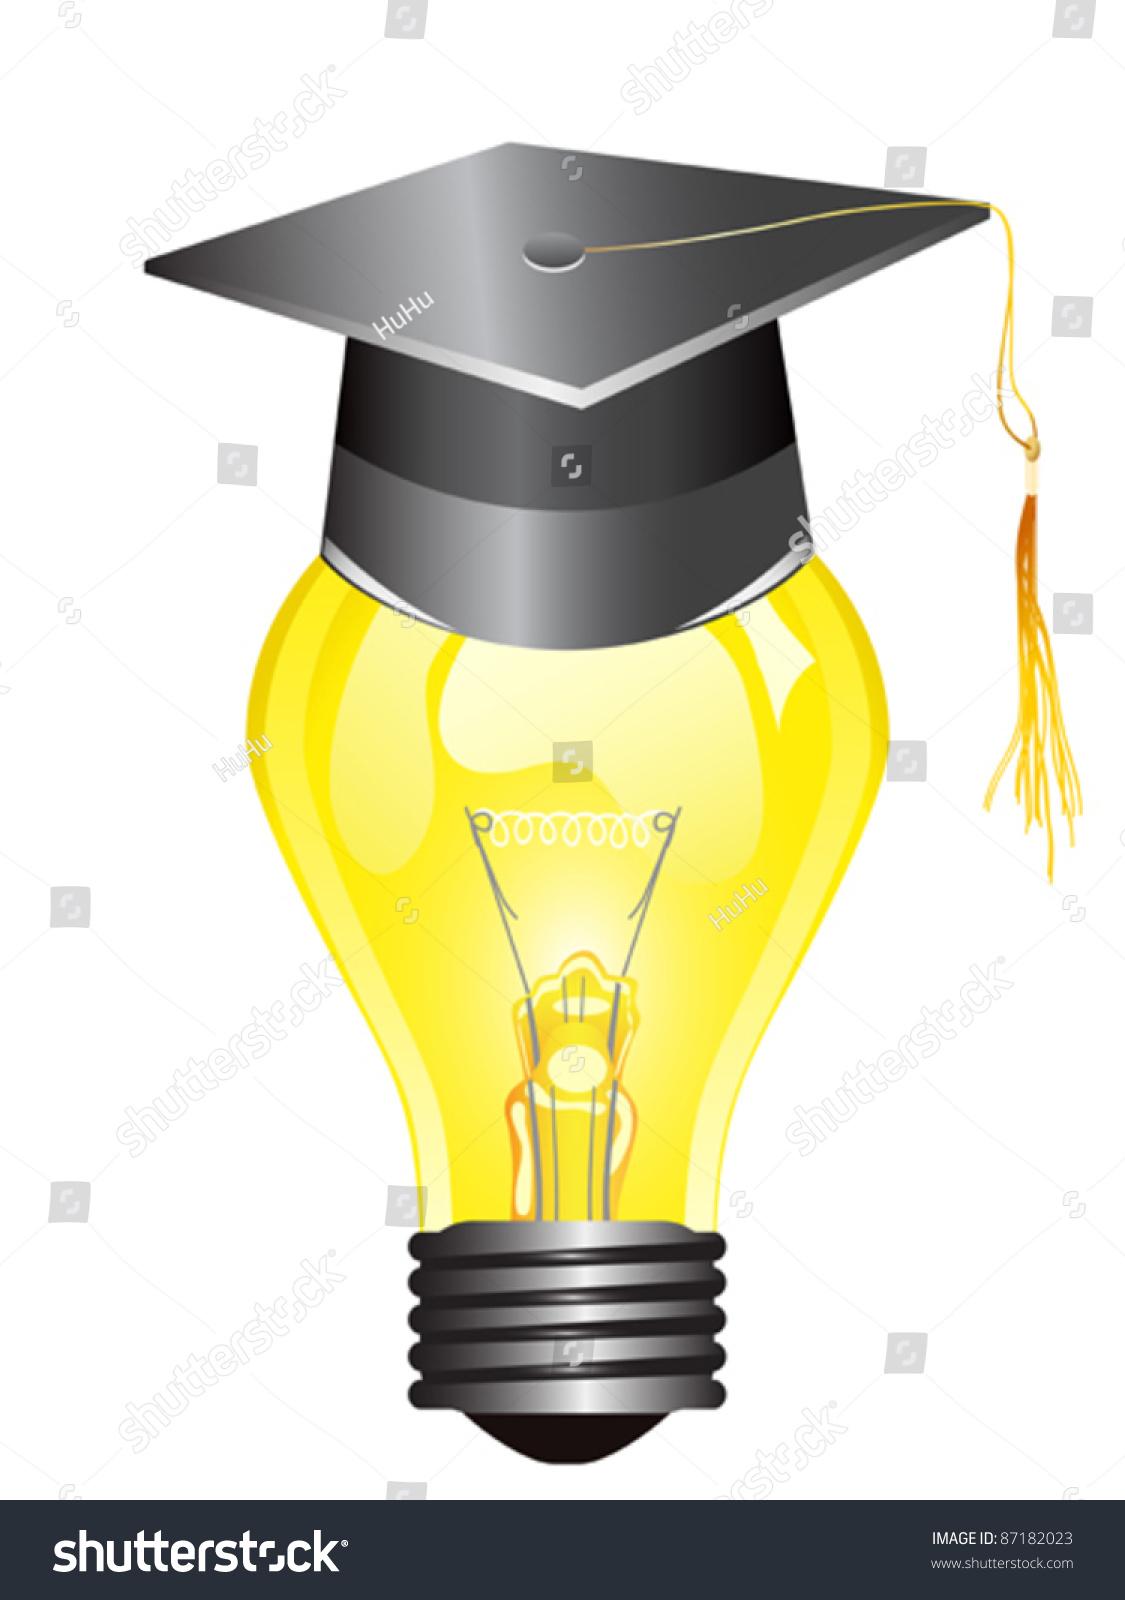 smart light bulb with mortar board stock vector illustration 87182023 shutterstock. Black Bedroom Furniture Sets. Home Design Ideas